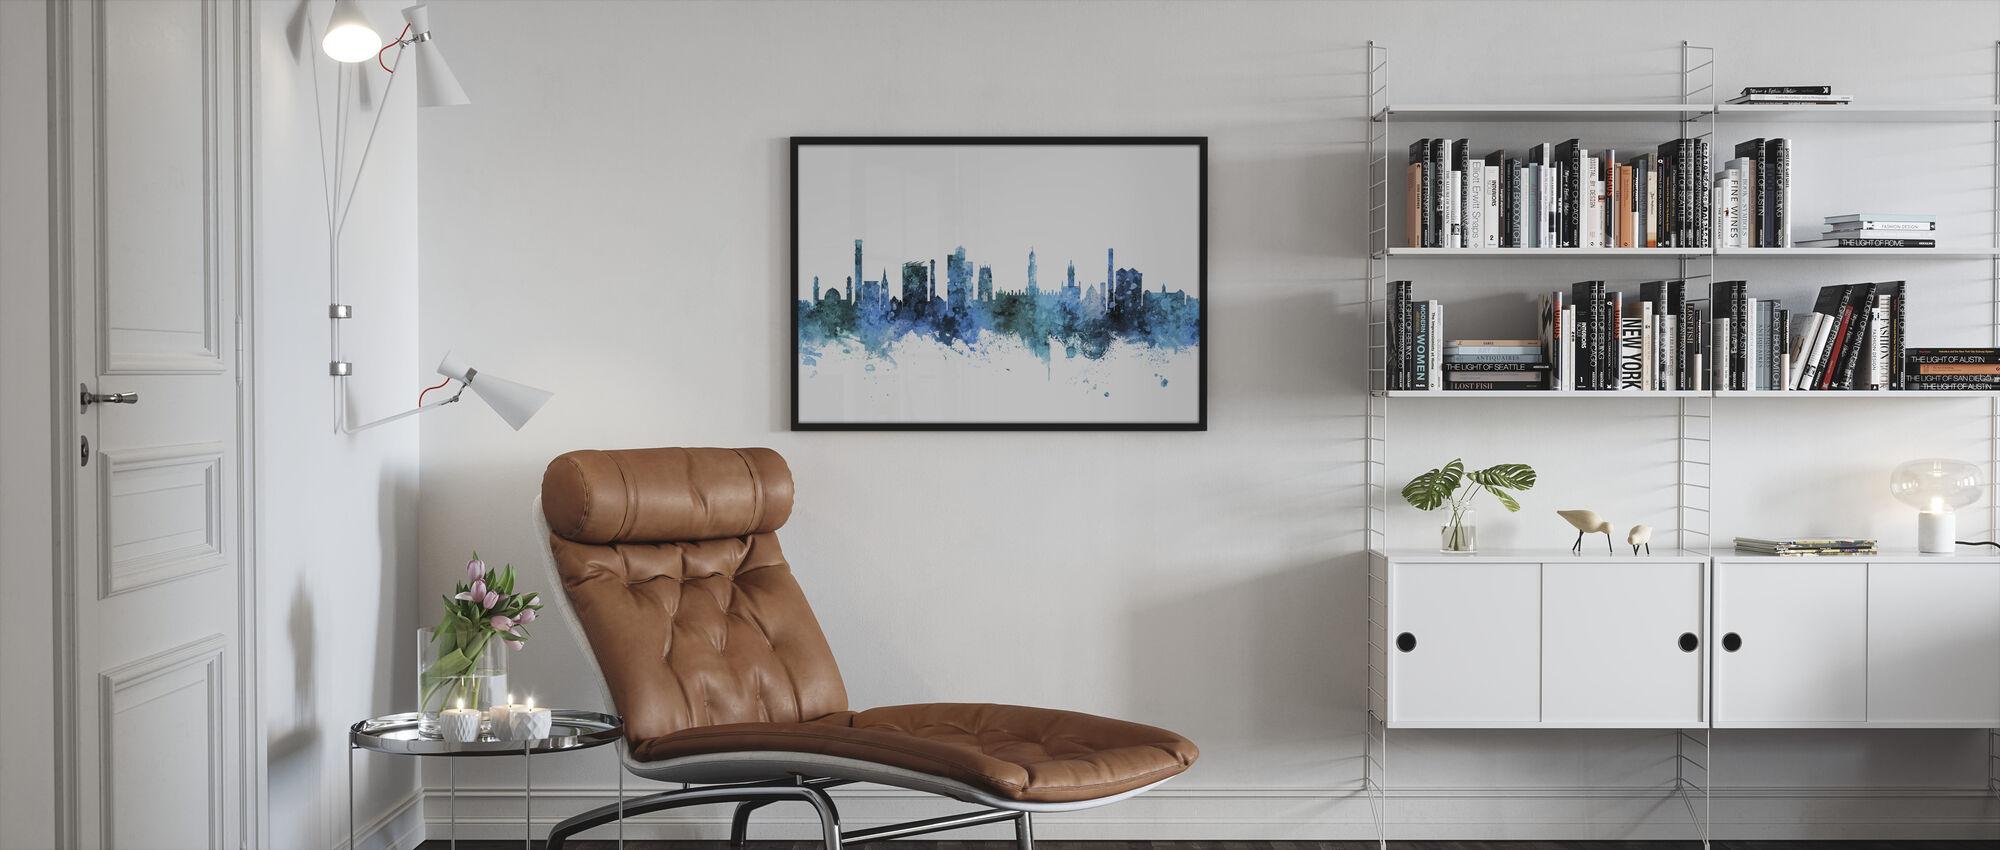 Bradford Englanti Skyline - Kehystetty kuva - Olohuone